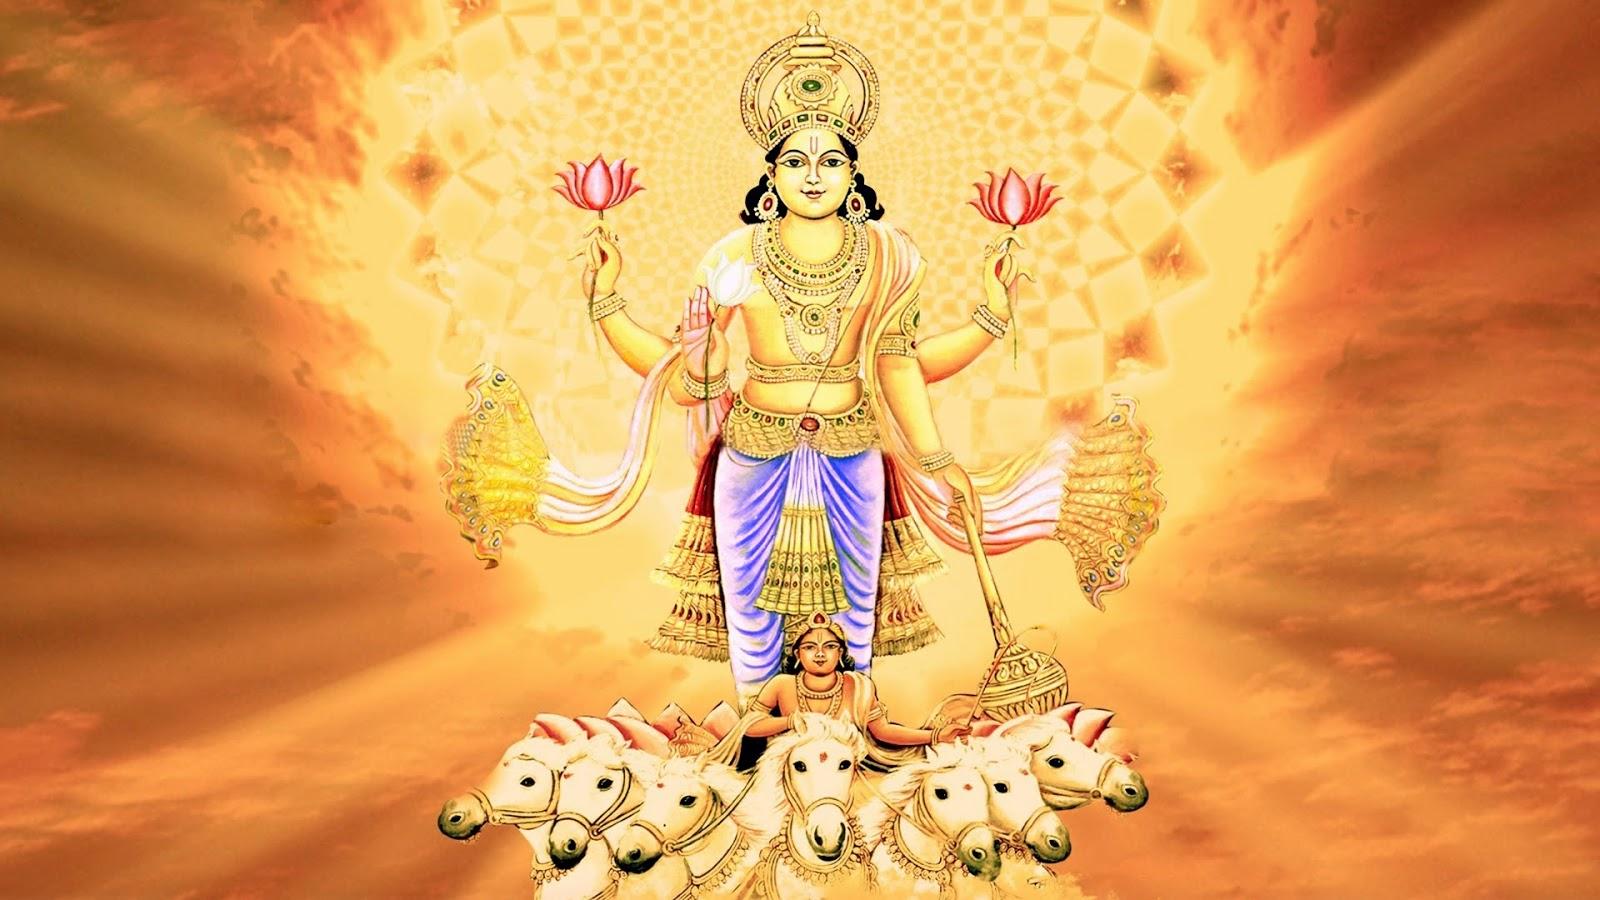 Scrutiny Lyrics Translation Of Surya Mantra Tat Savitur Vrnimahe